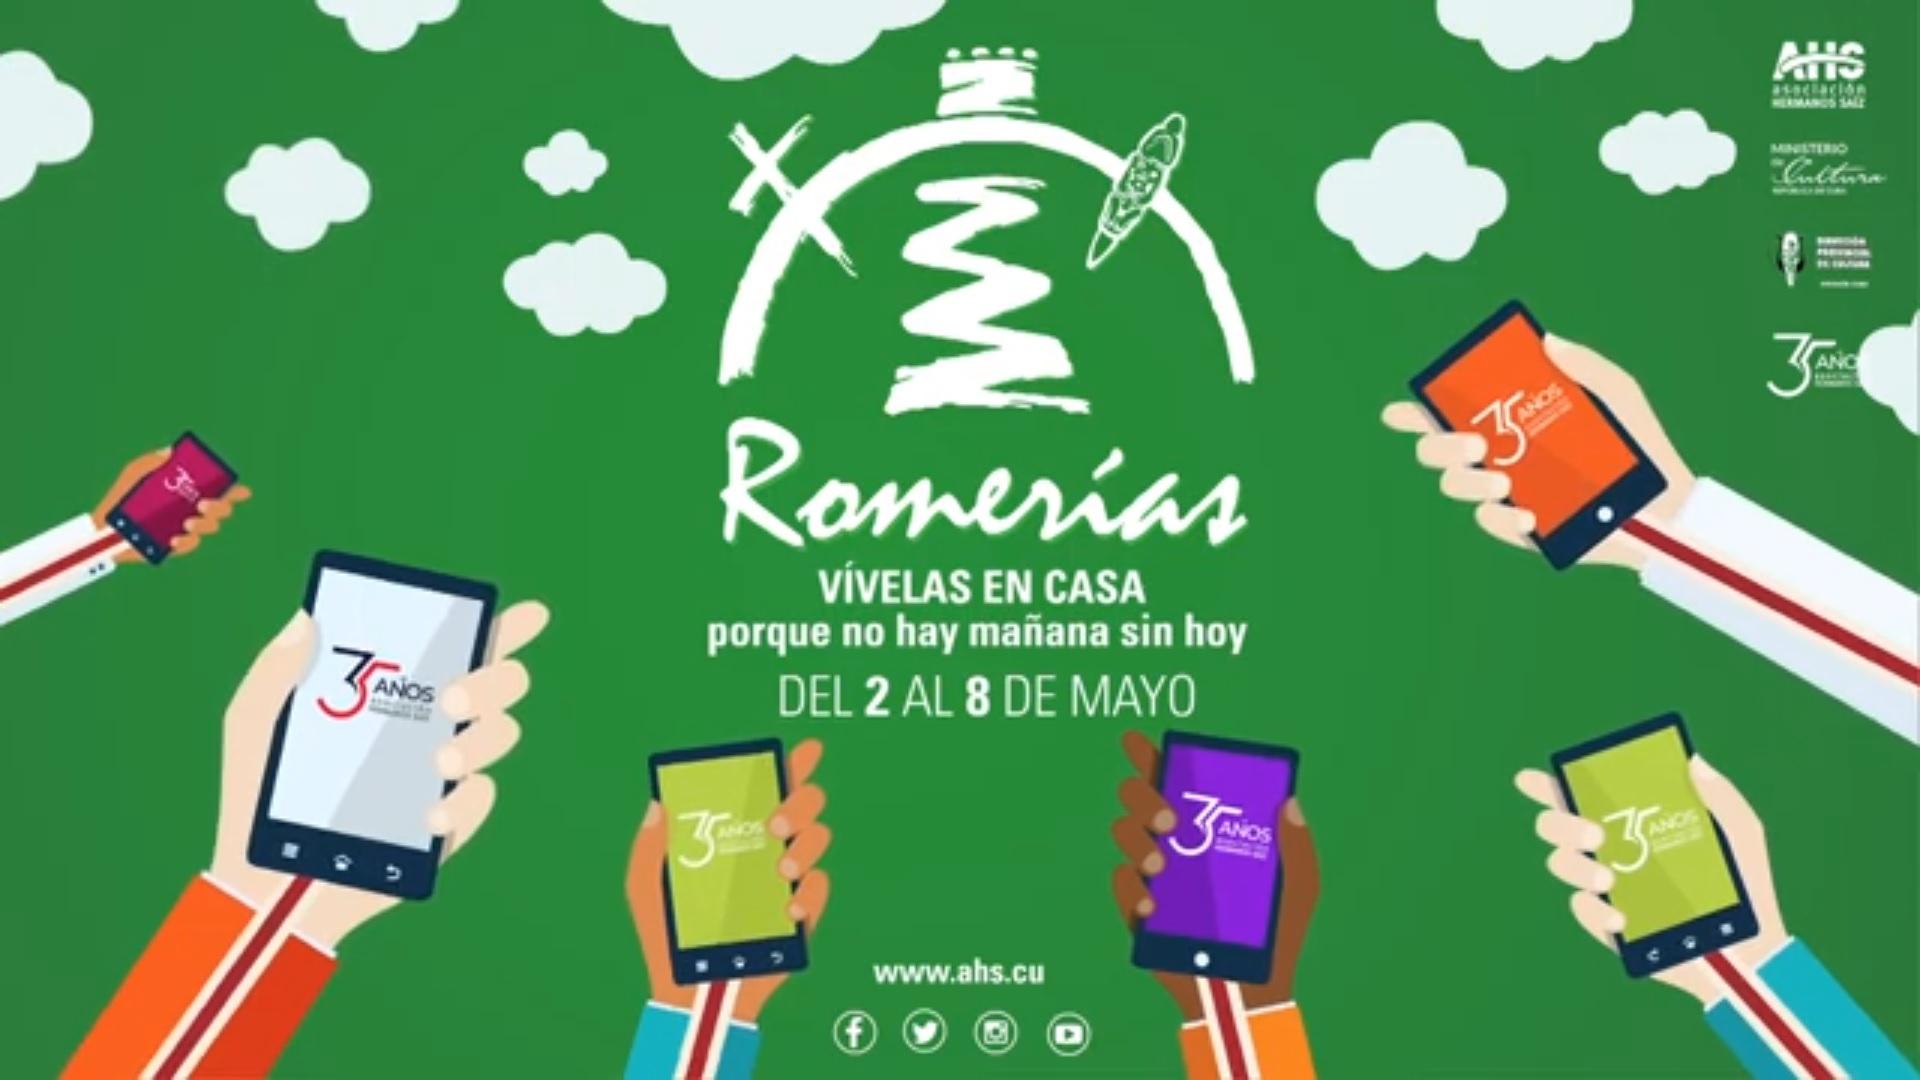 Romerías de Mayo on line 2021